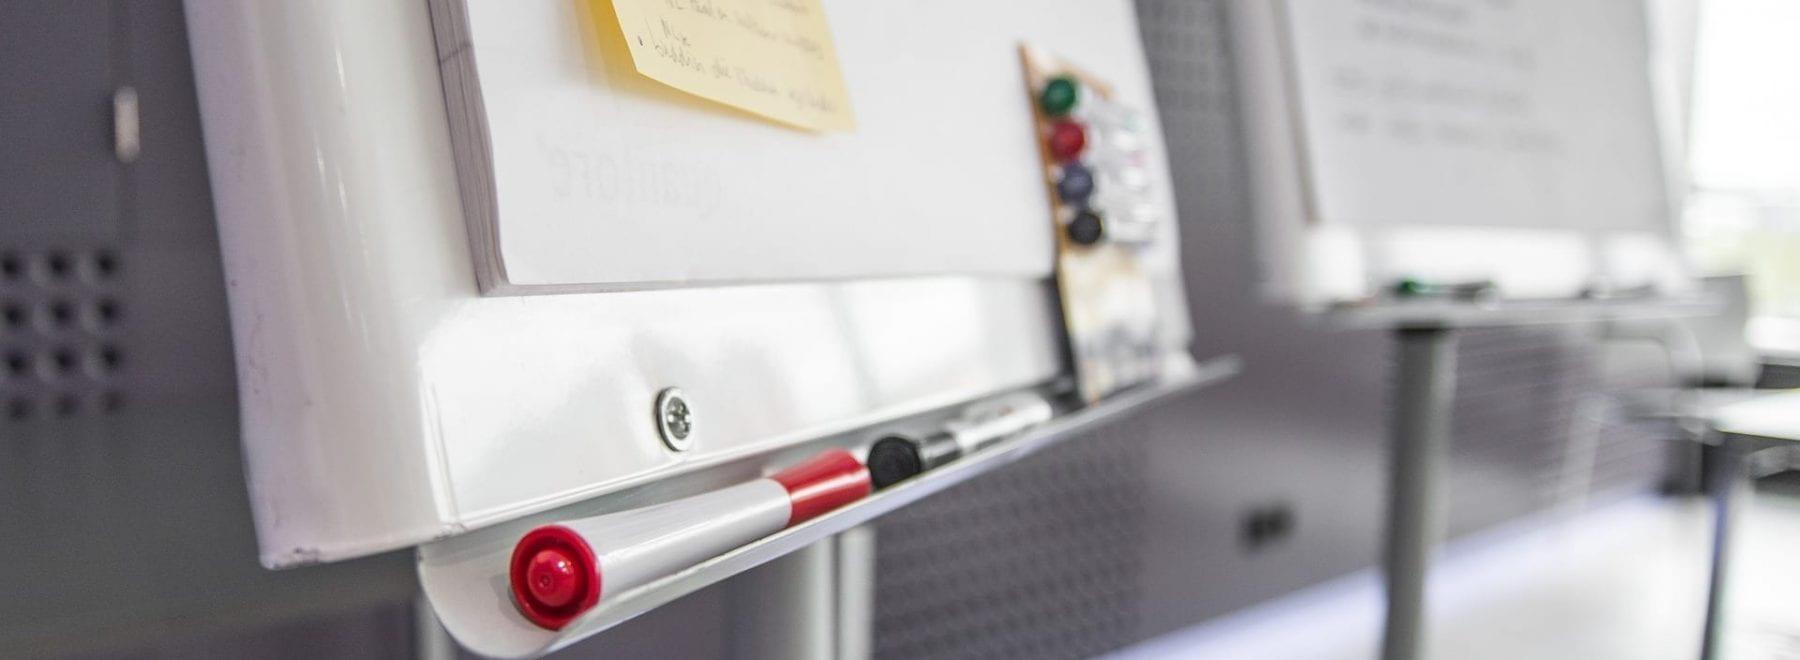 whiteboard, pens, sticky notes